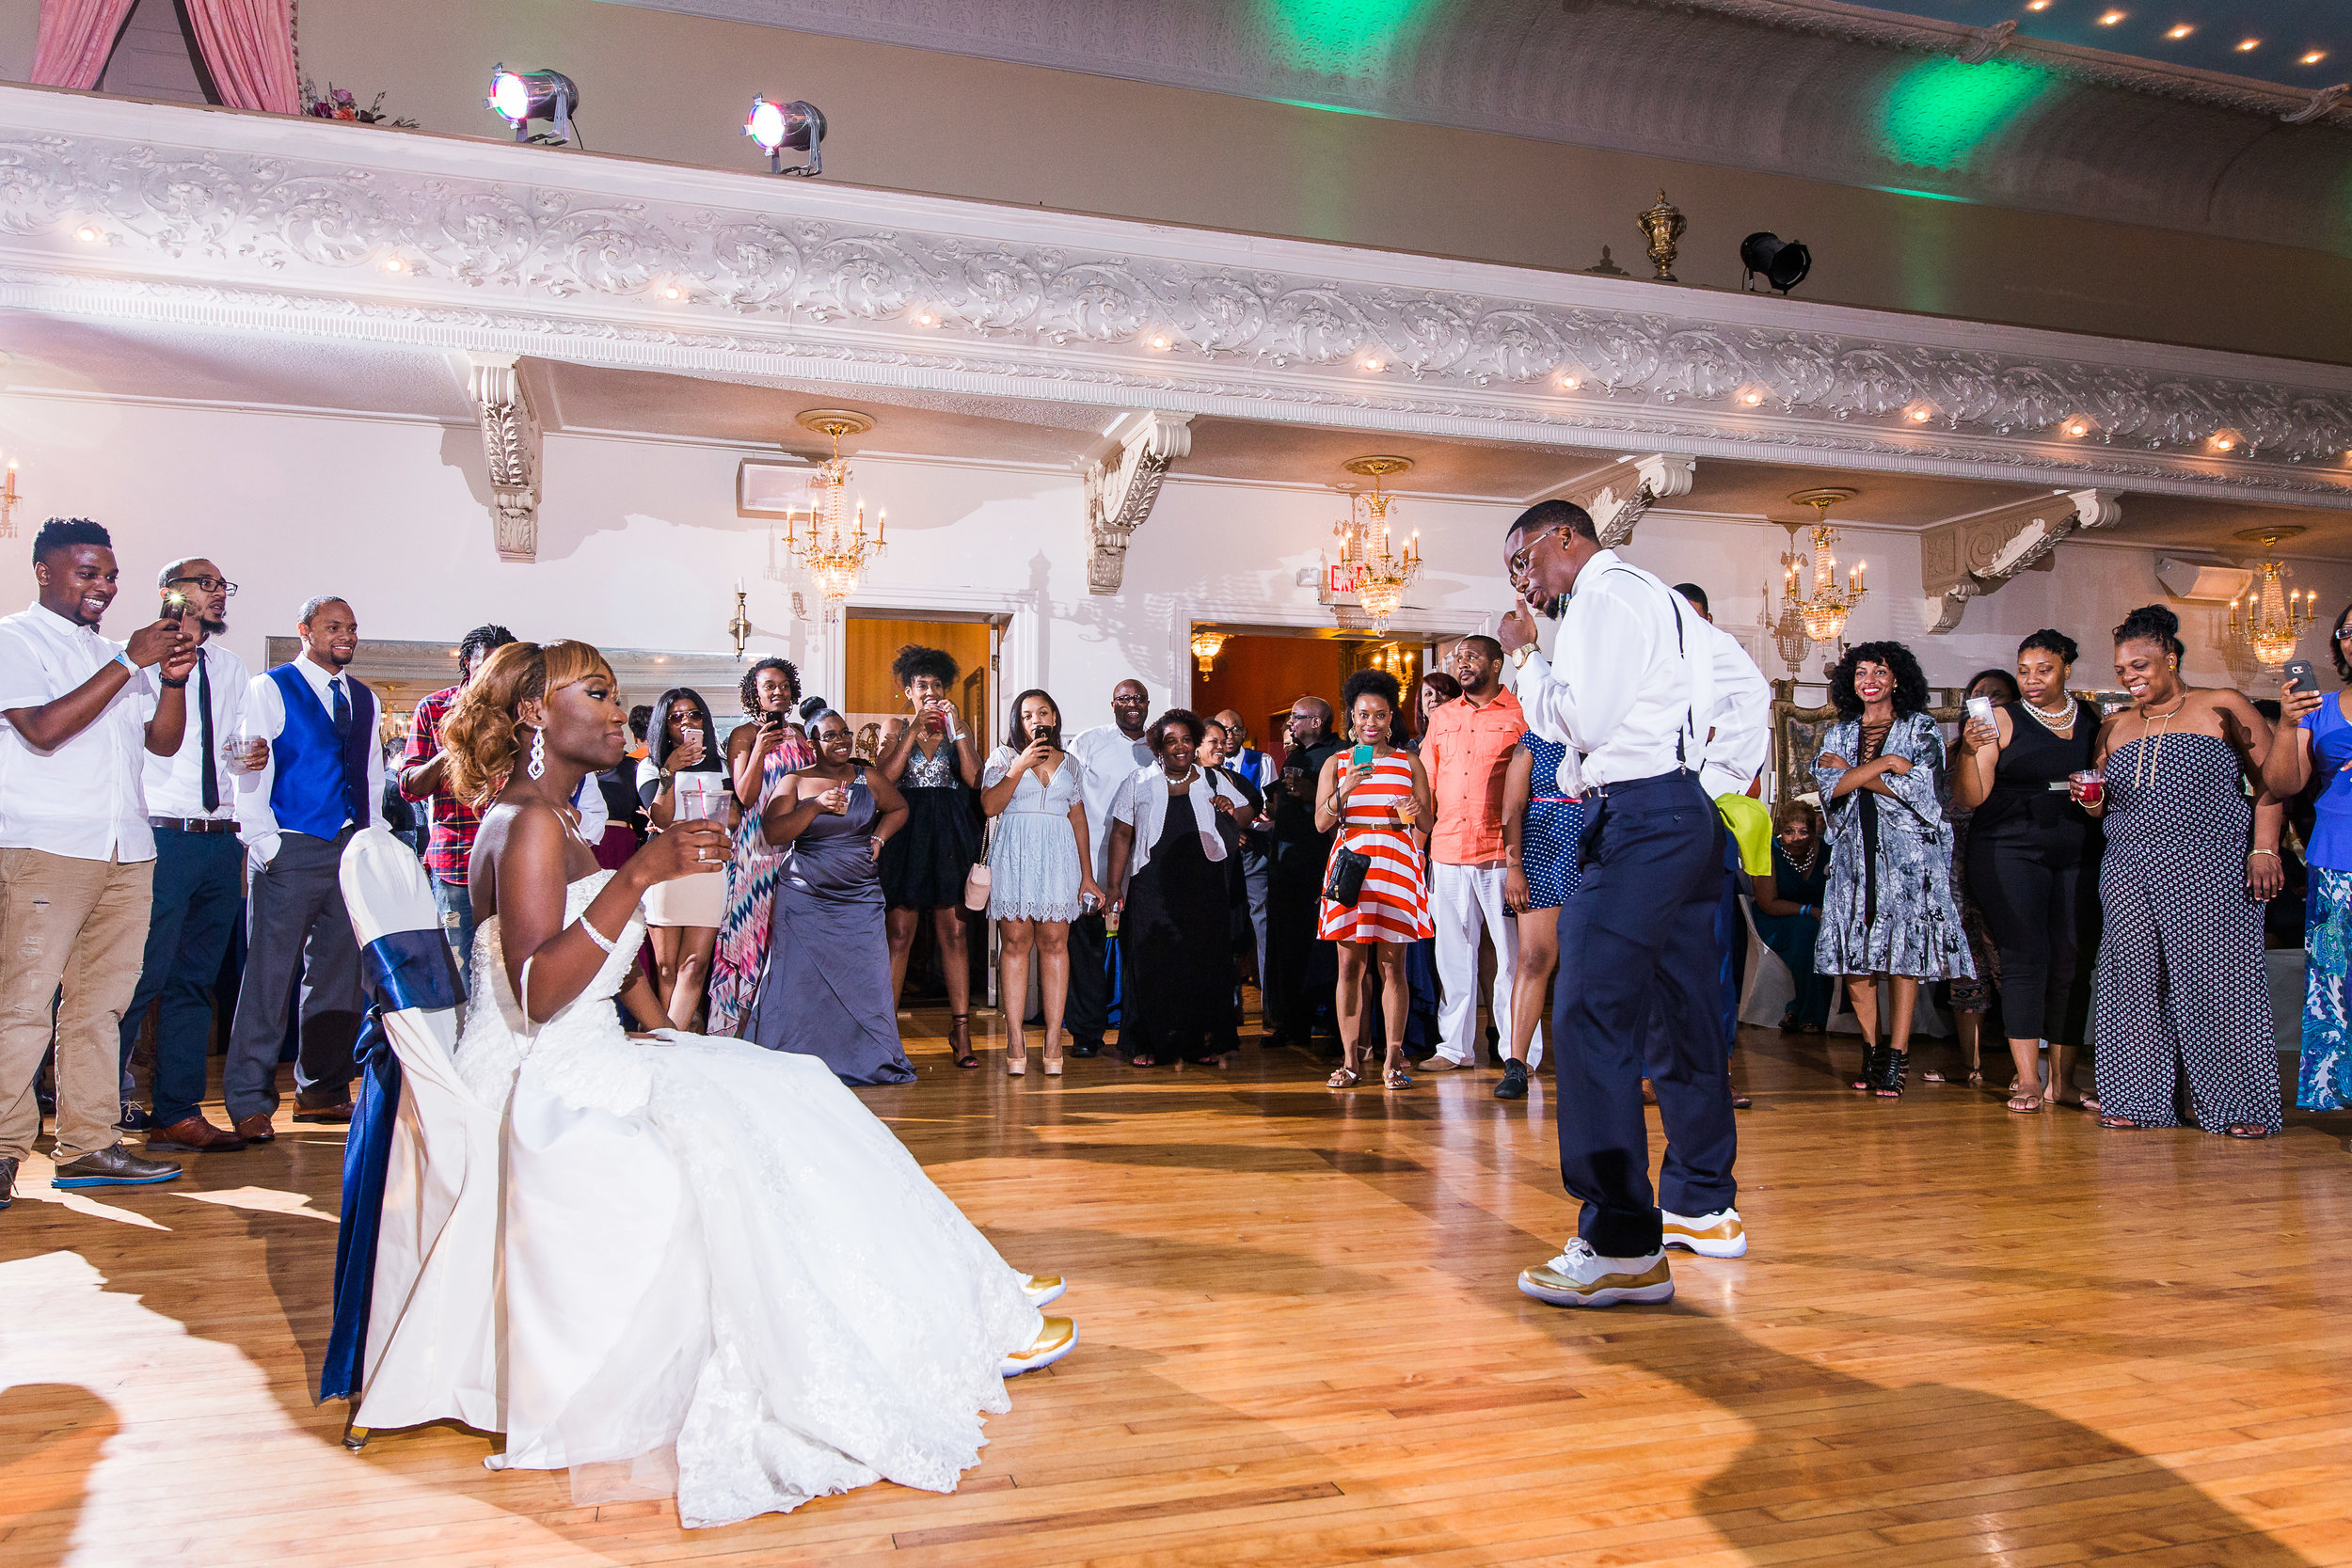 st-louis-wedding-photographer-chris-and-tiffany-mahler-ballroom-639.jpg